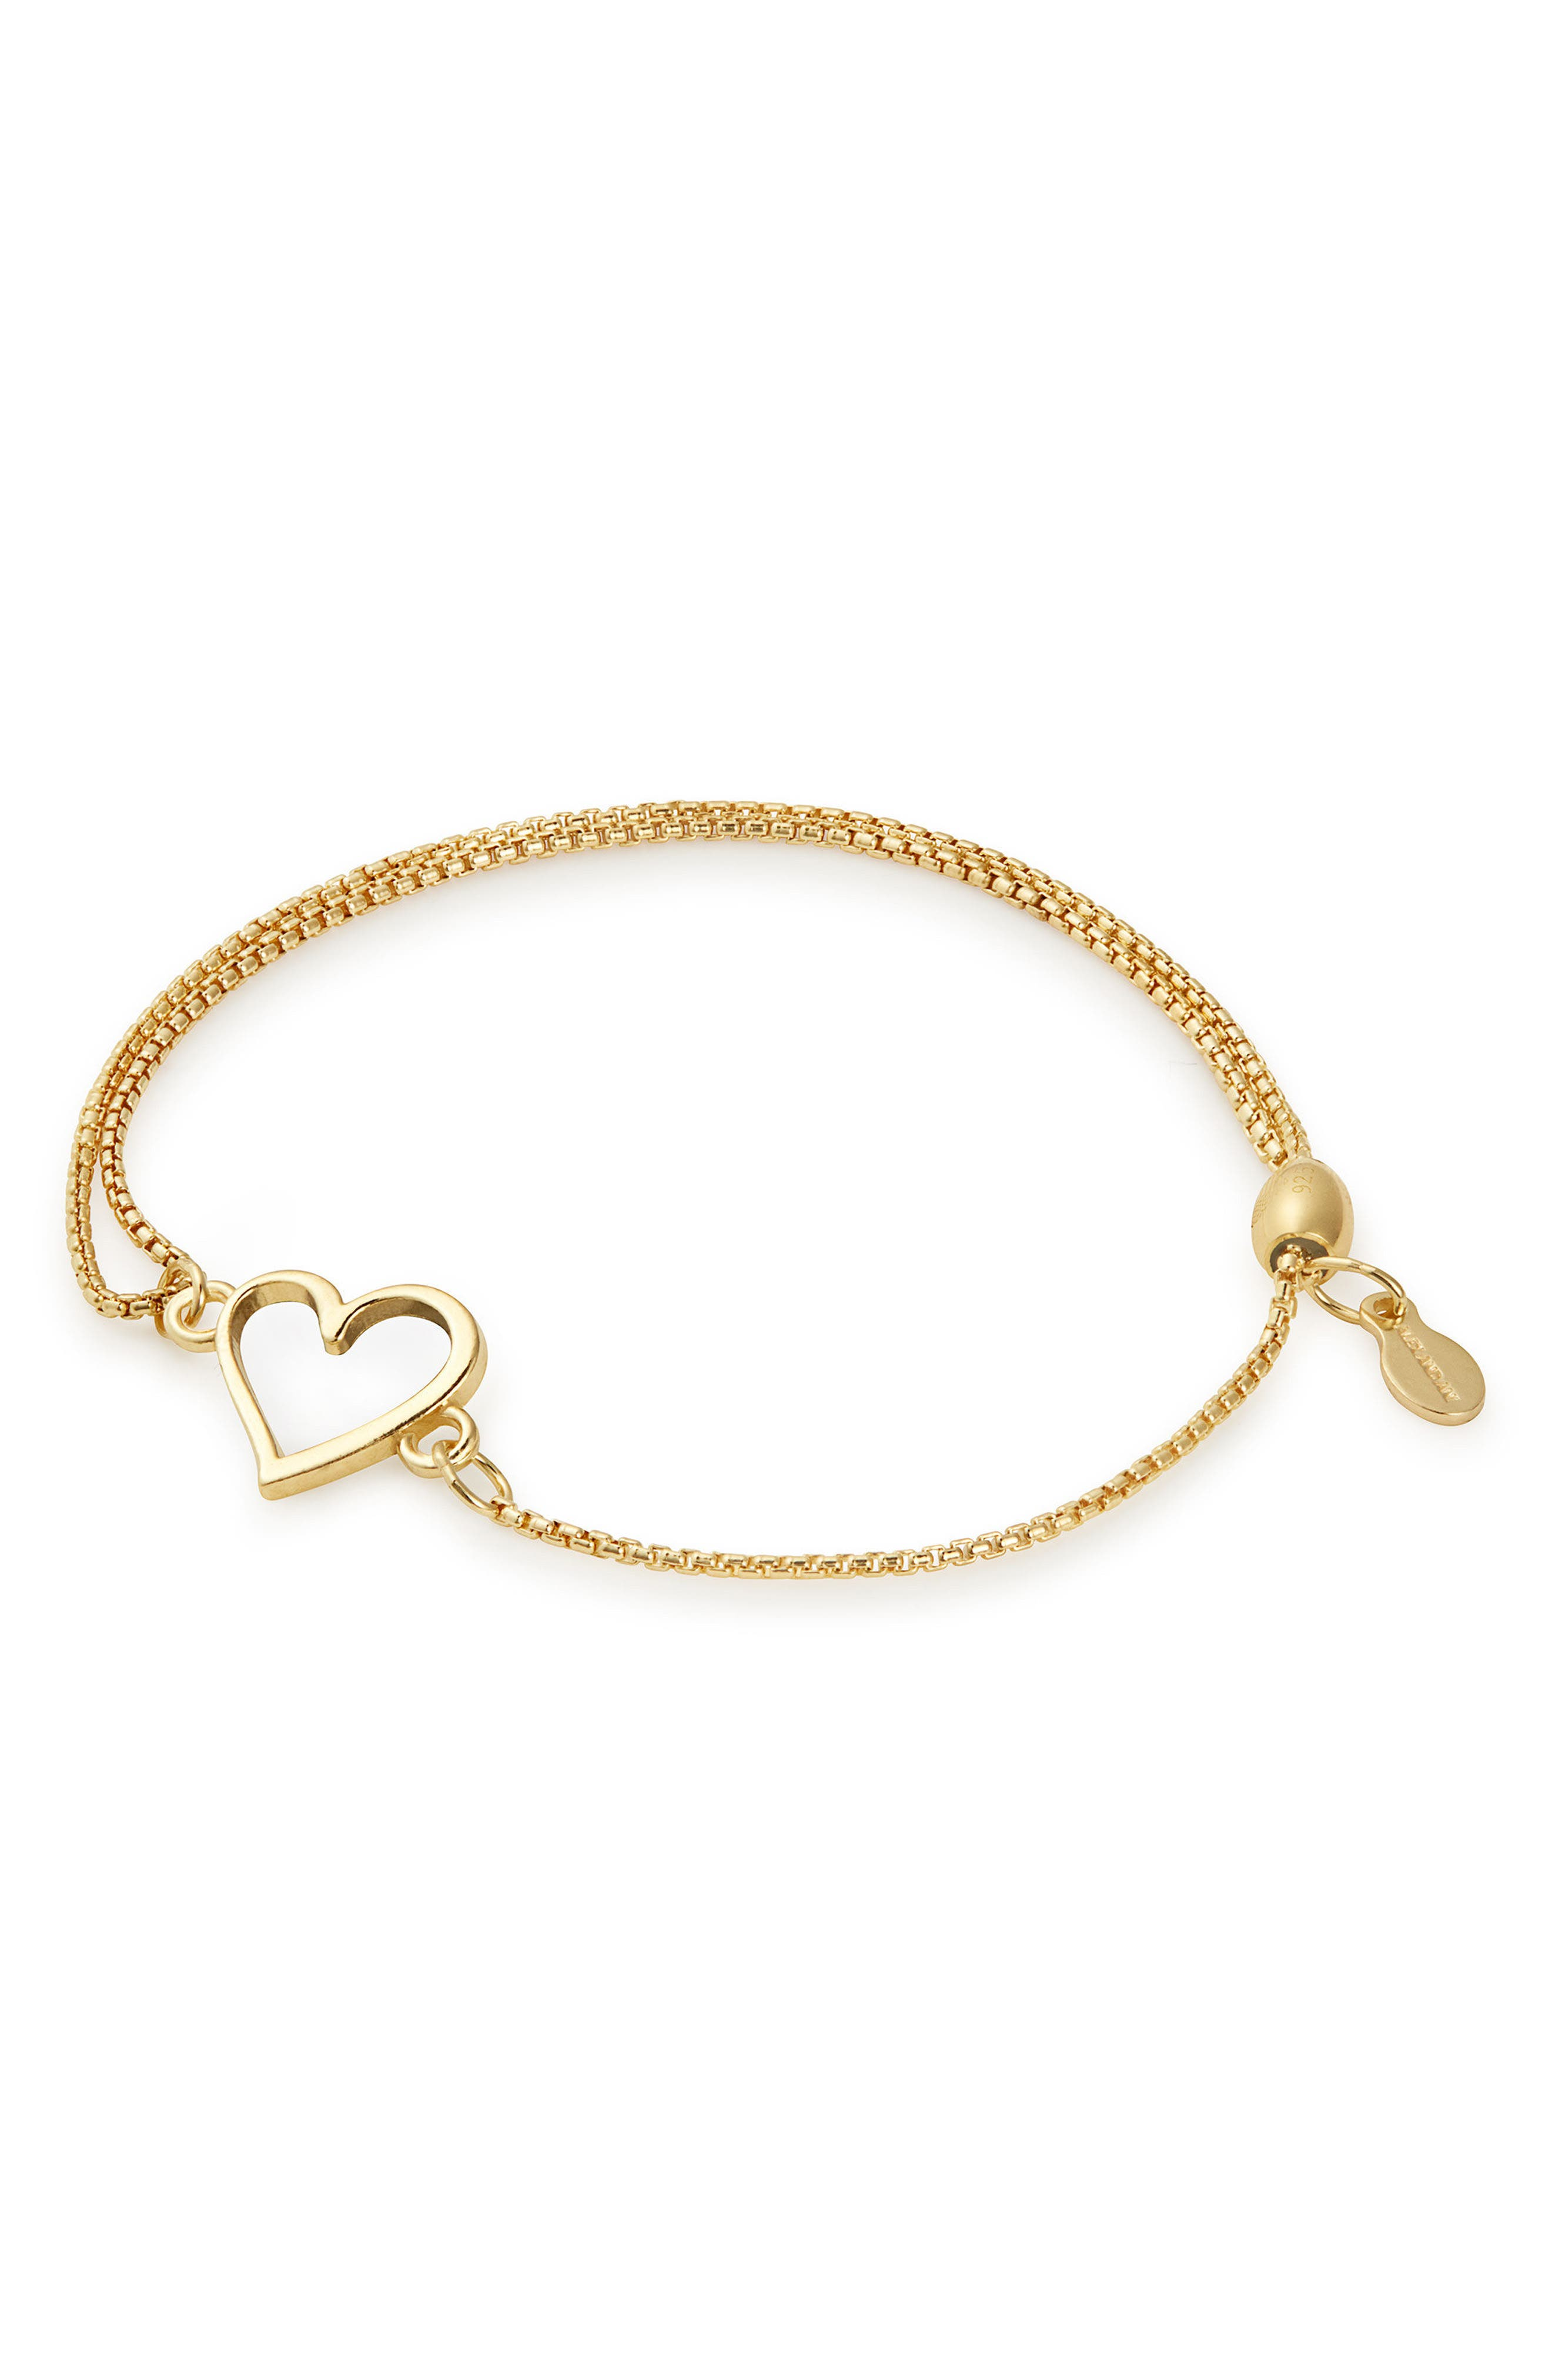 Heart Pull Chain Bracelet,                             Main thumbnail 1, color,                             GOLD